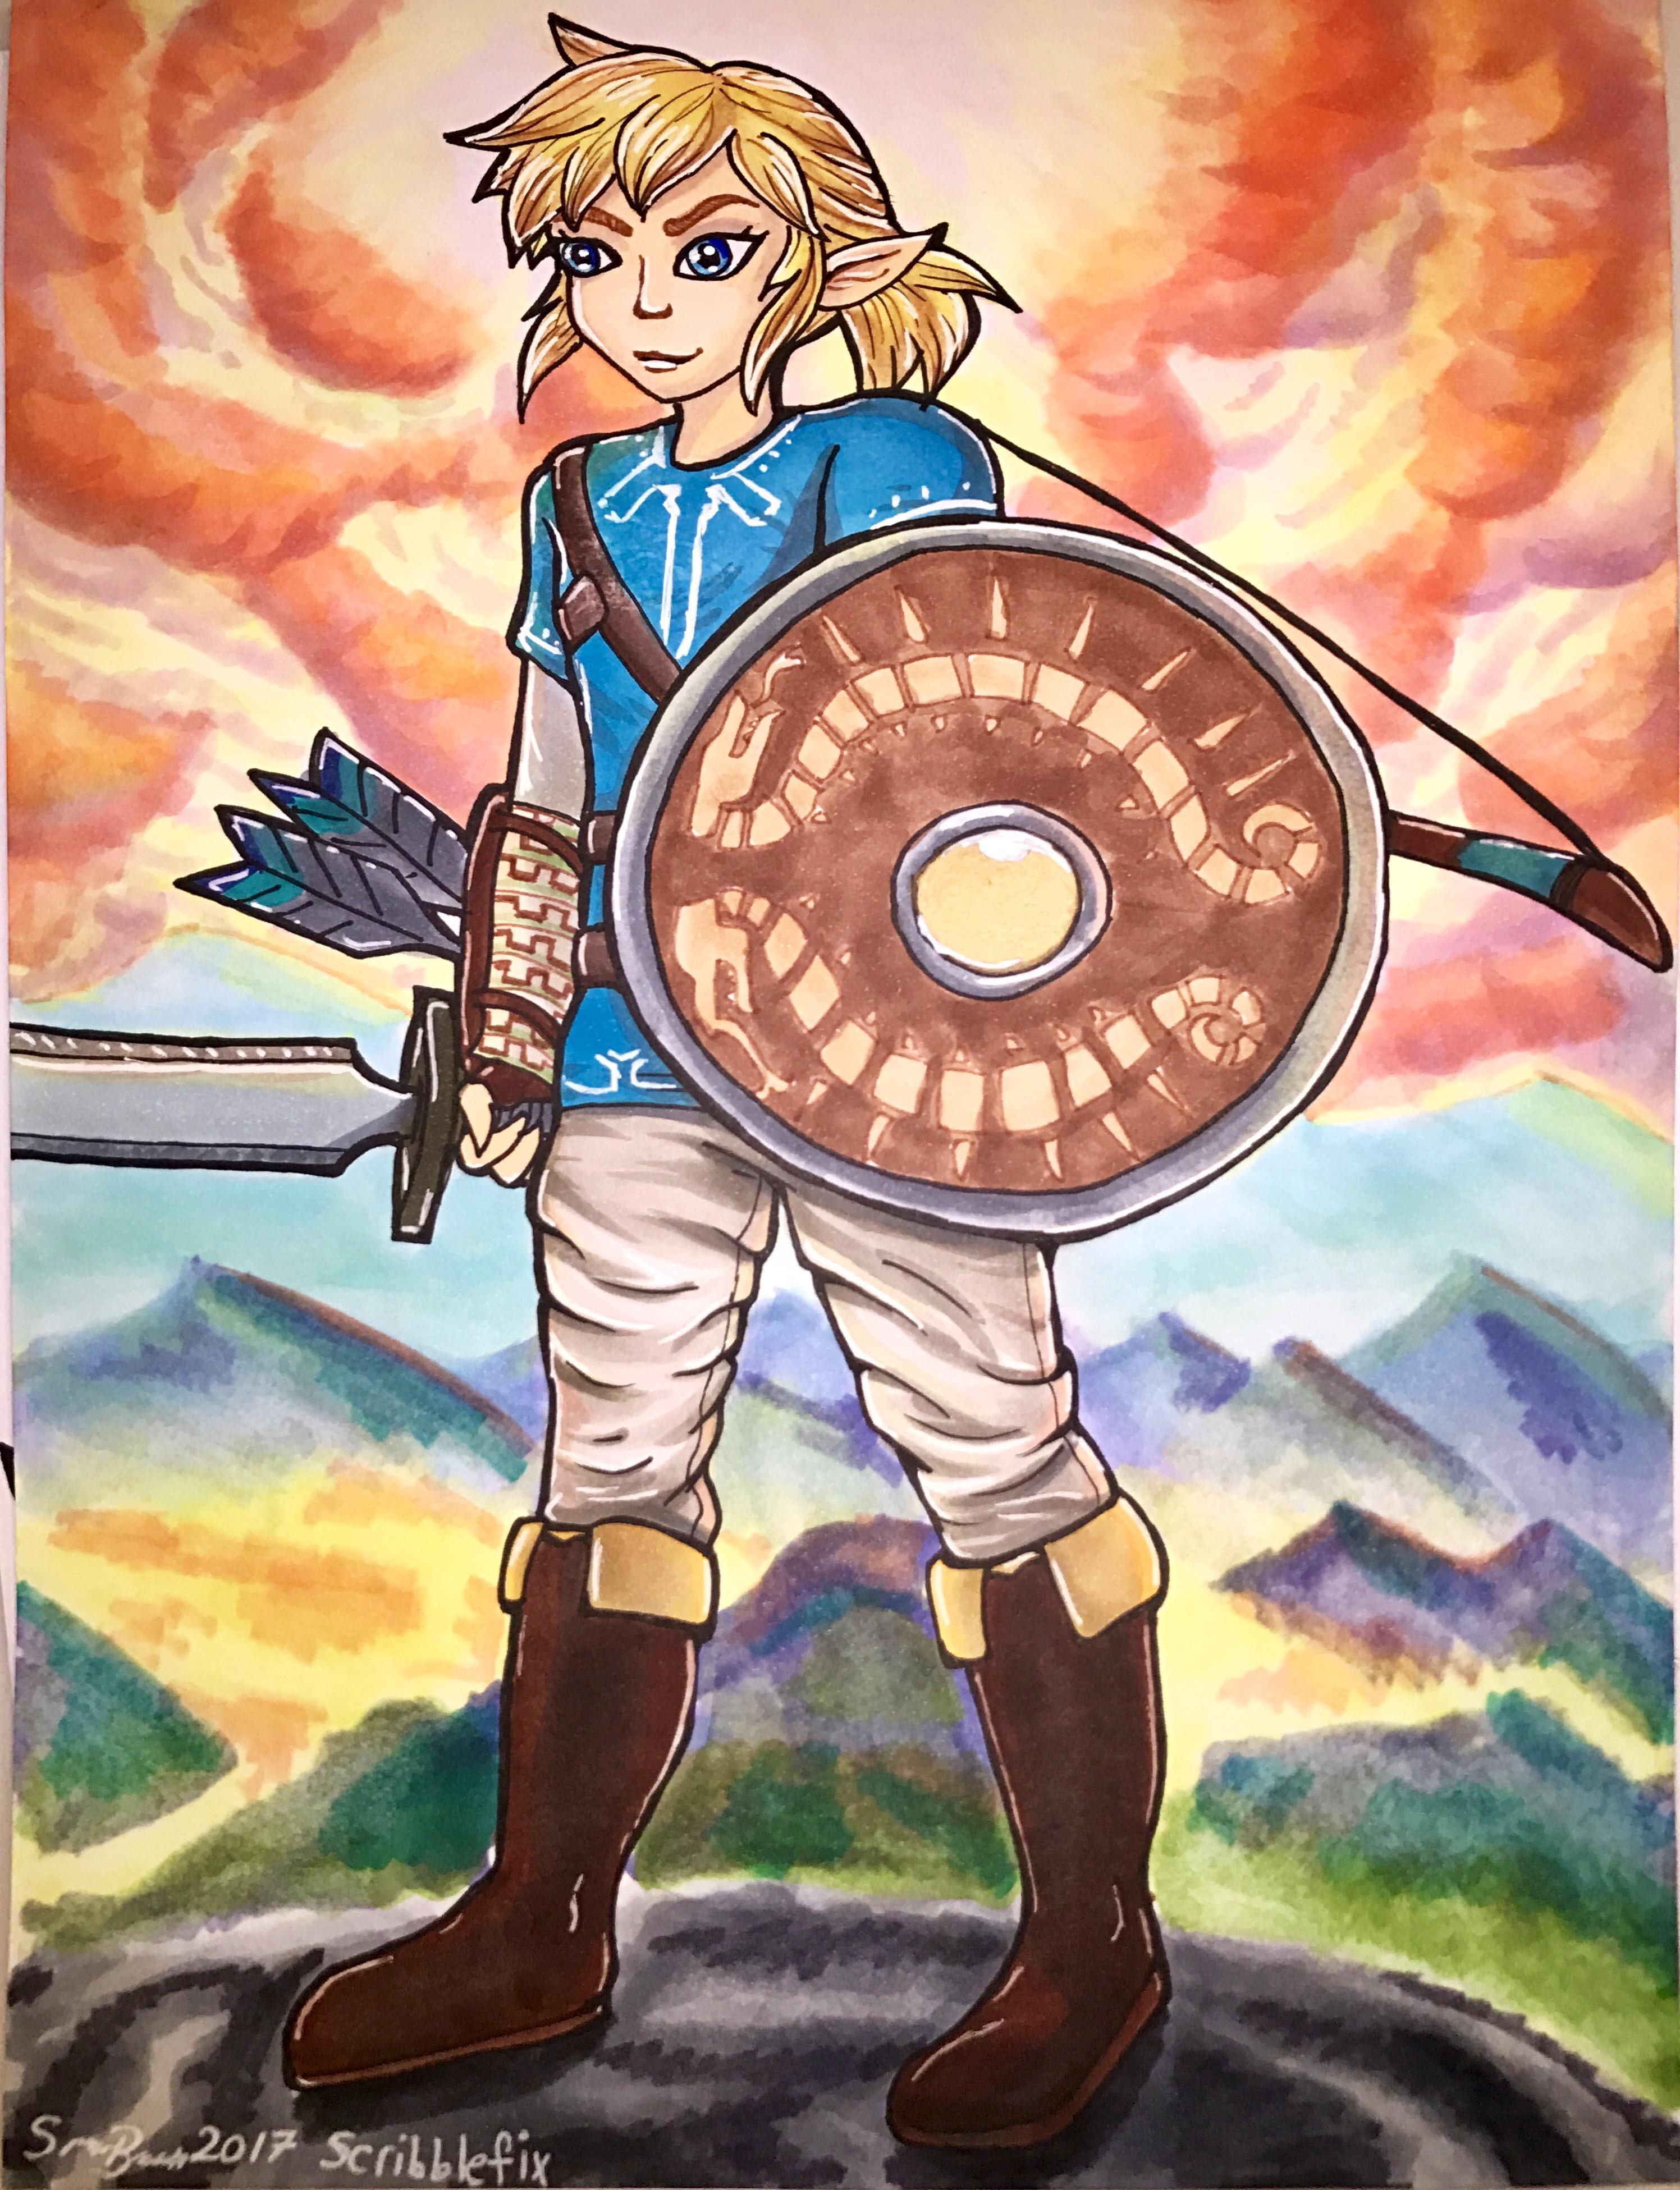 Link - Zelda BOTW copic illustration